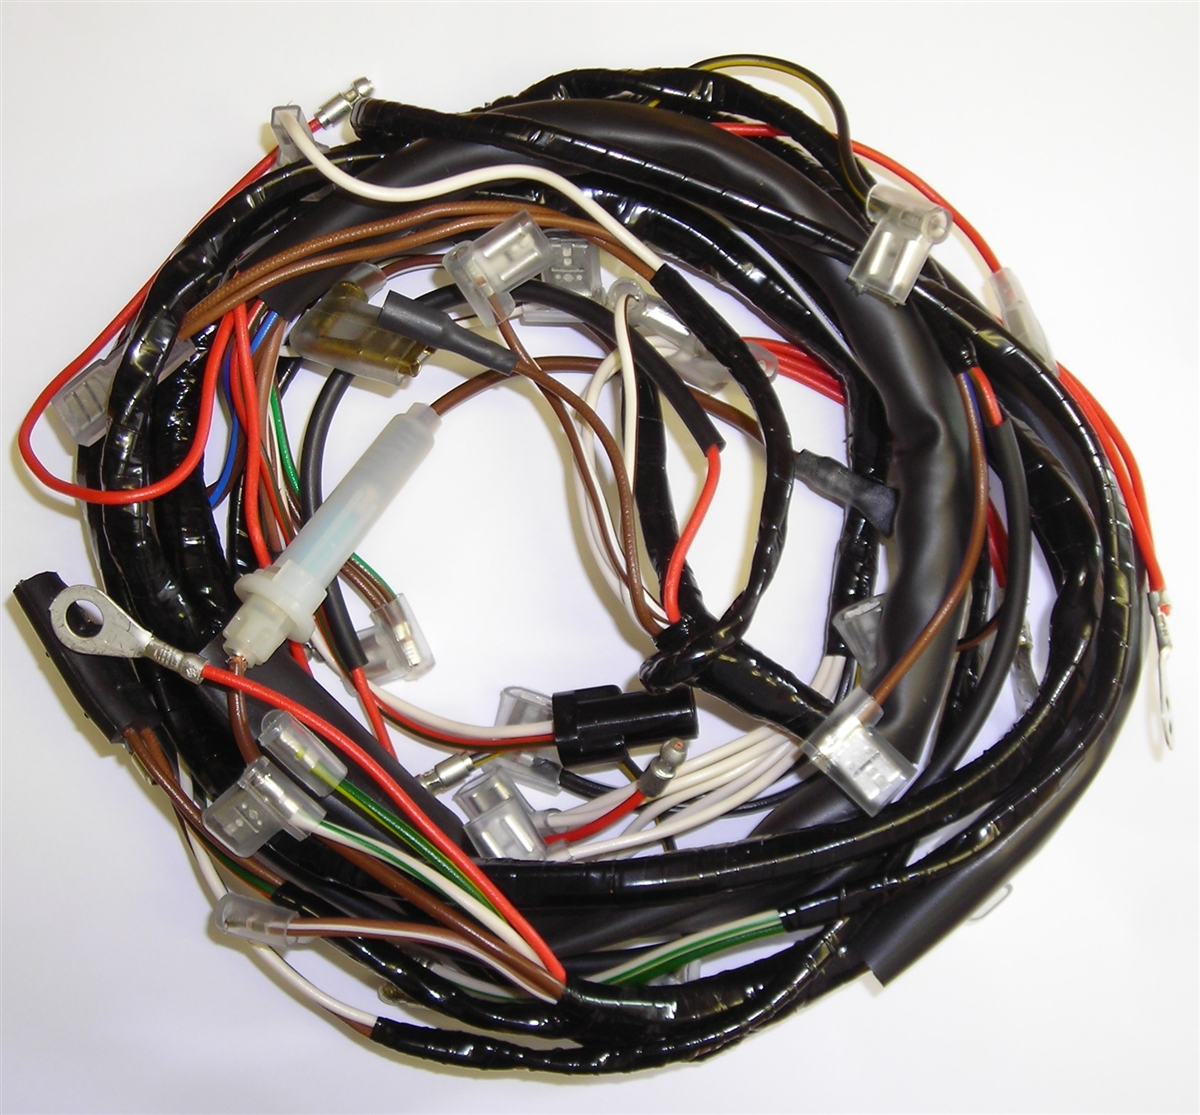 Triumph T100, T120 & TR6 Motorcycle Wiring HarnessBritish Wiring